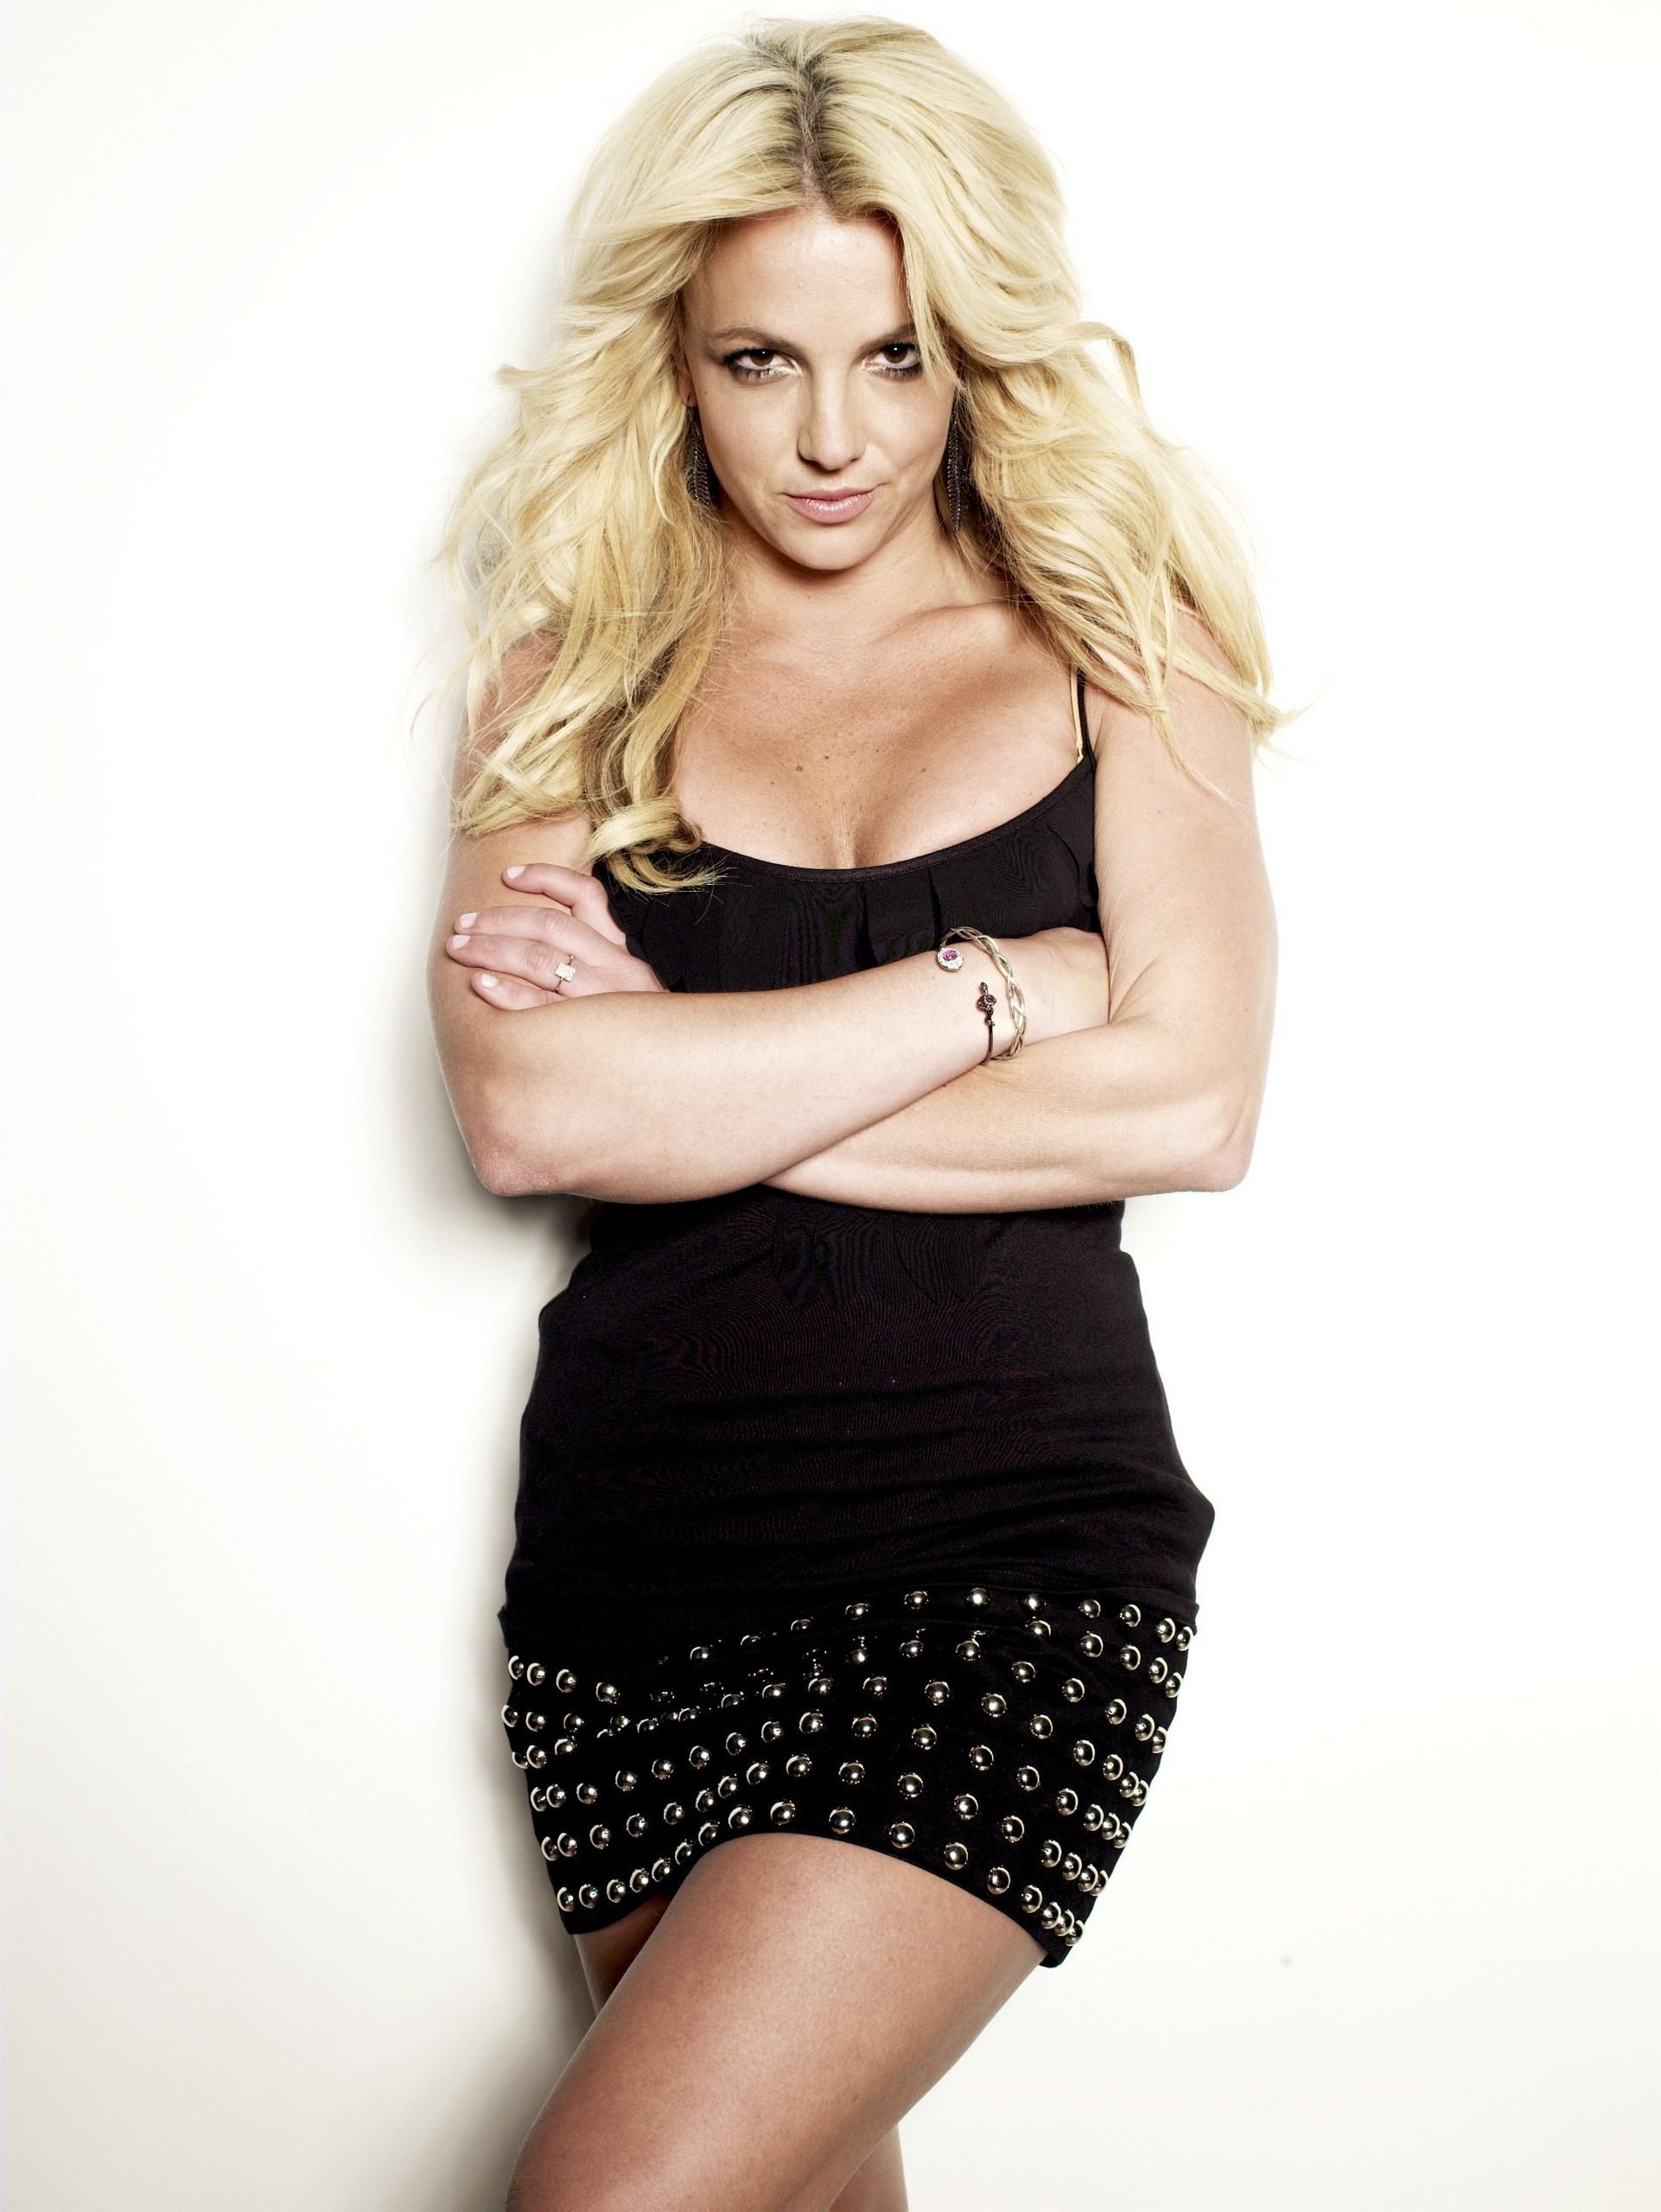 Britney ❤-Photoshoot 2010-Cliff Watts,Cosmopolitan